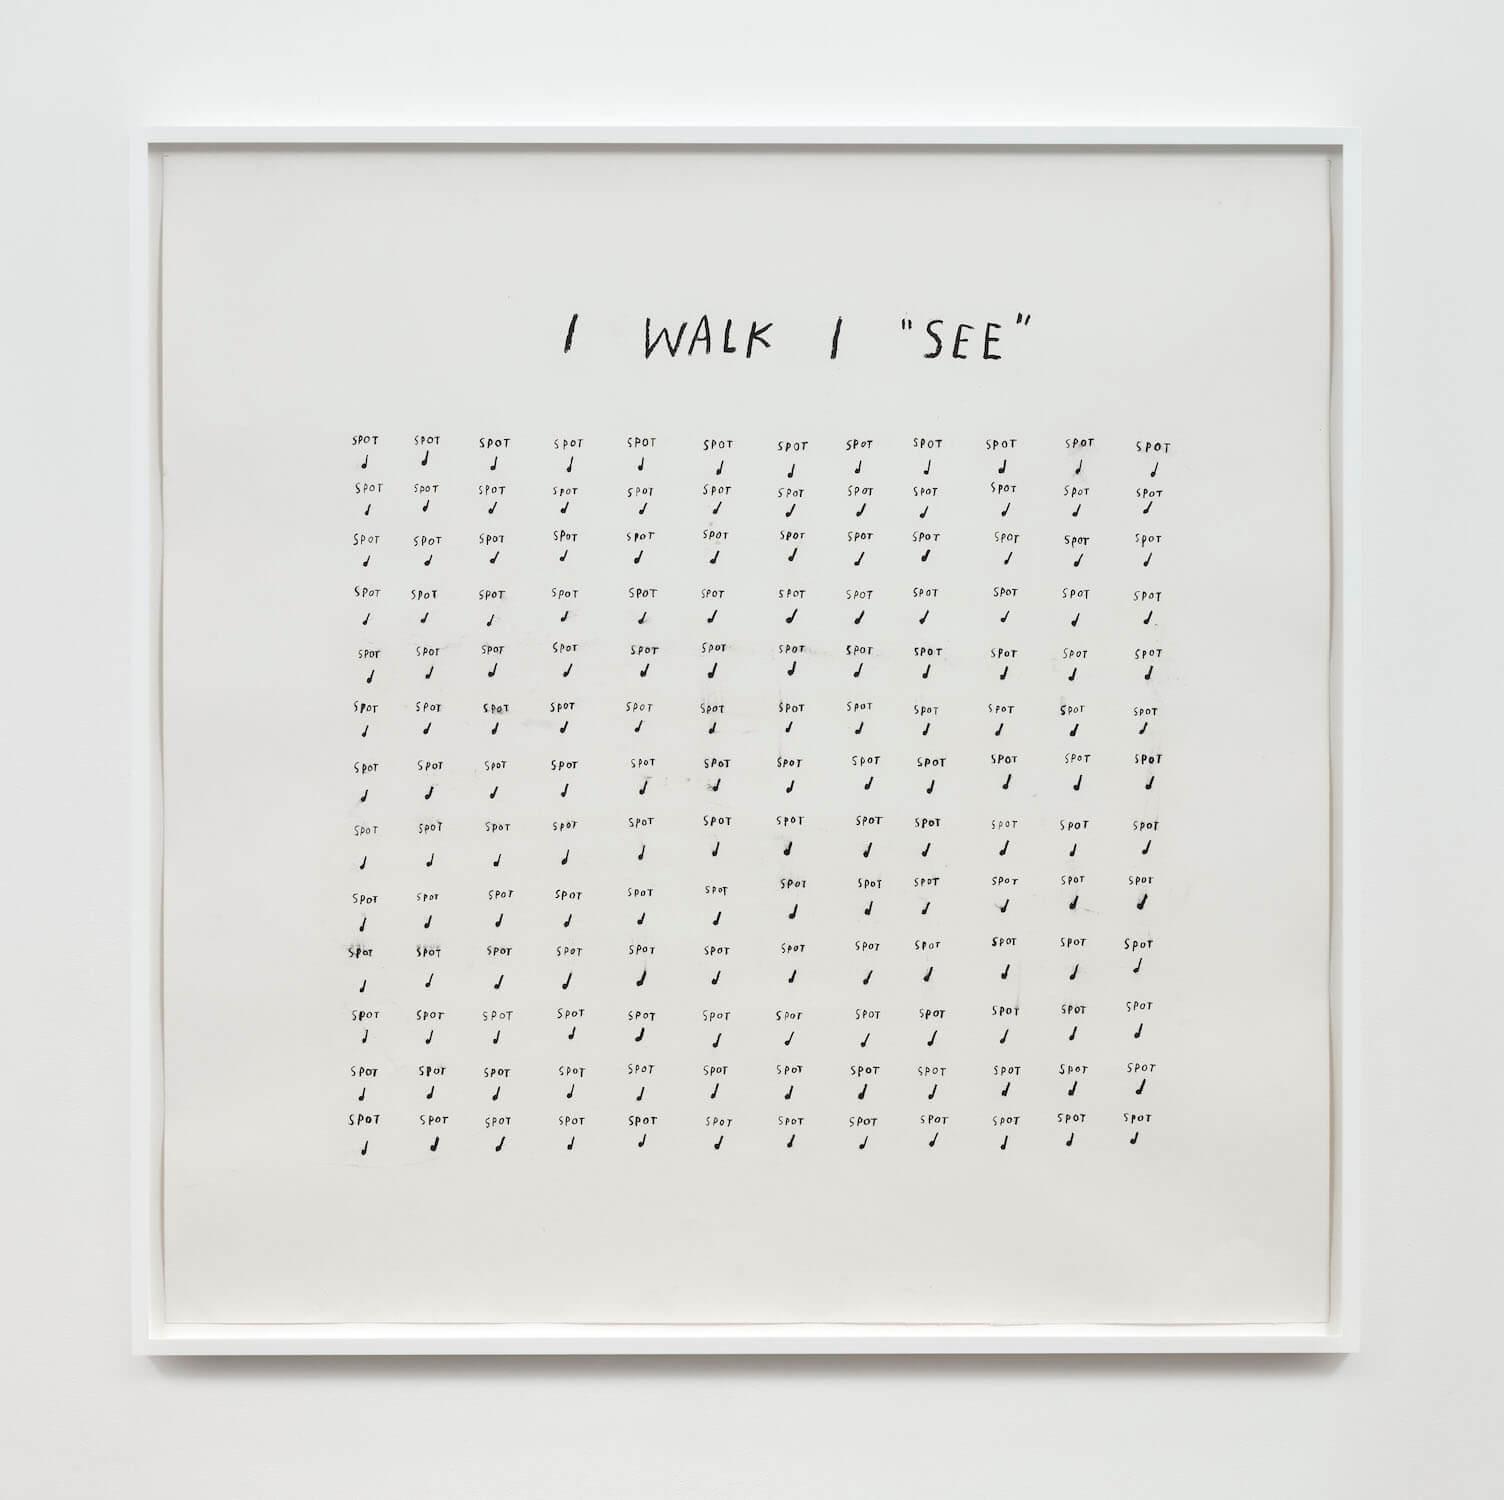 Kim, I Walk I See, 2020 (CSK 20.029) A